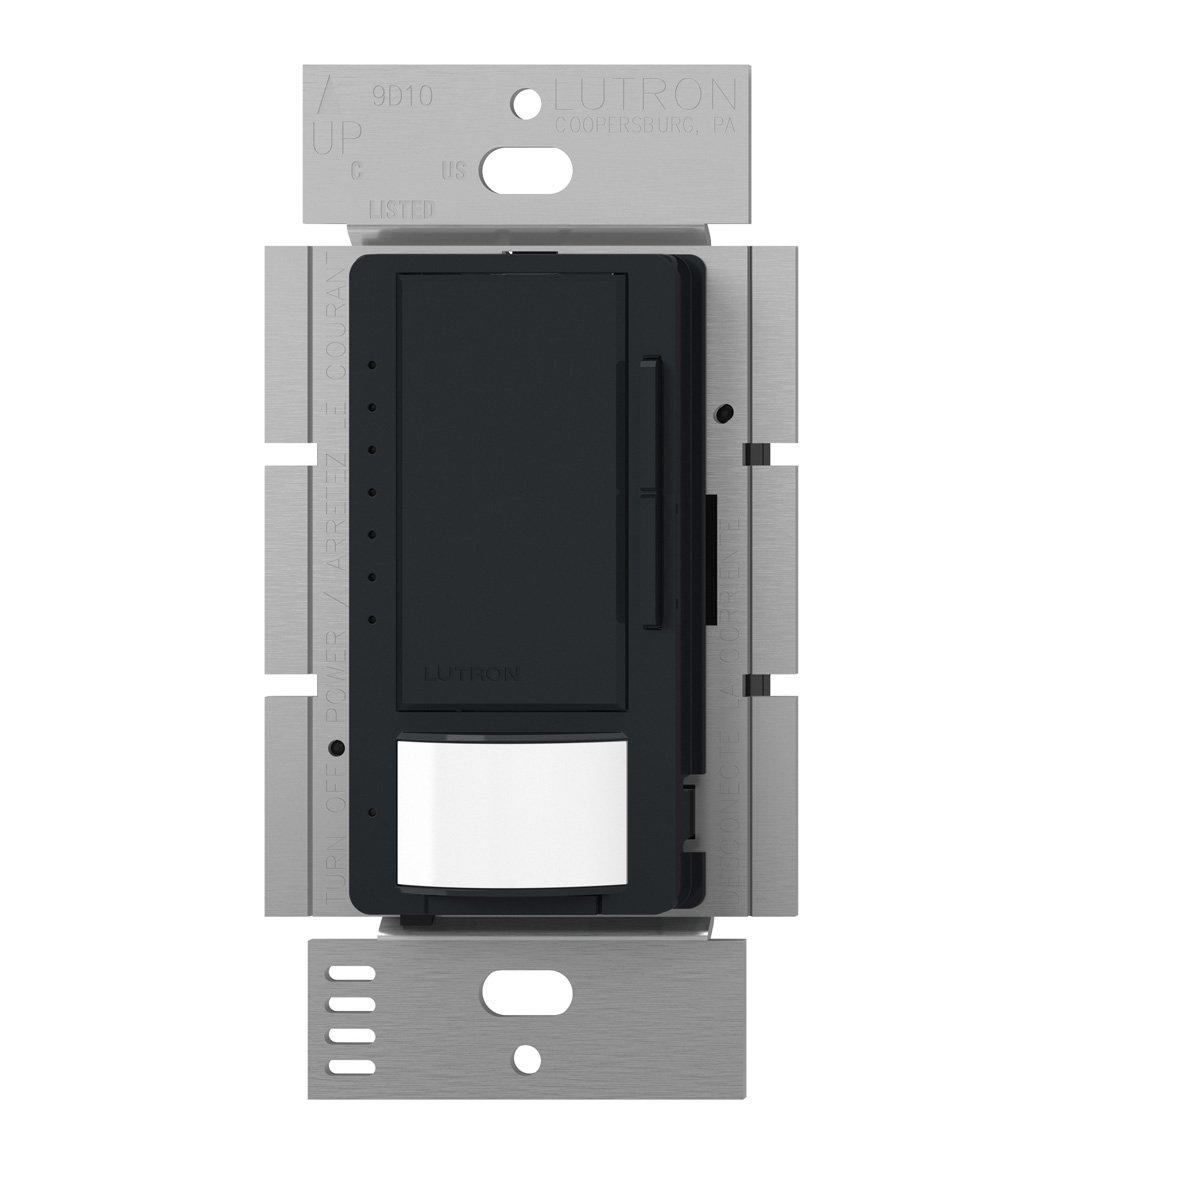 Lutron Maestro CL単極/ multi-location Vacancy Sensingディマー MSCL-VP153M-BL 1 B00FQL1XWC ブラック ブラック